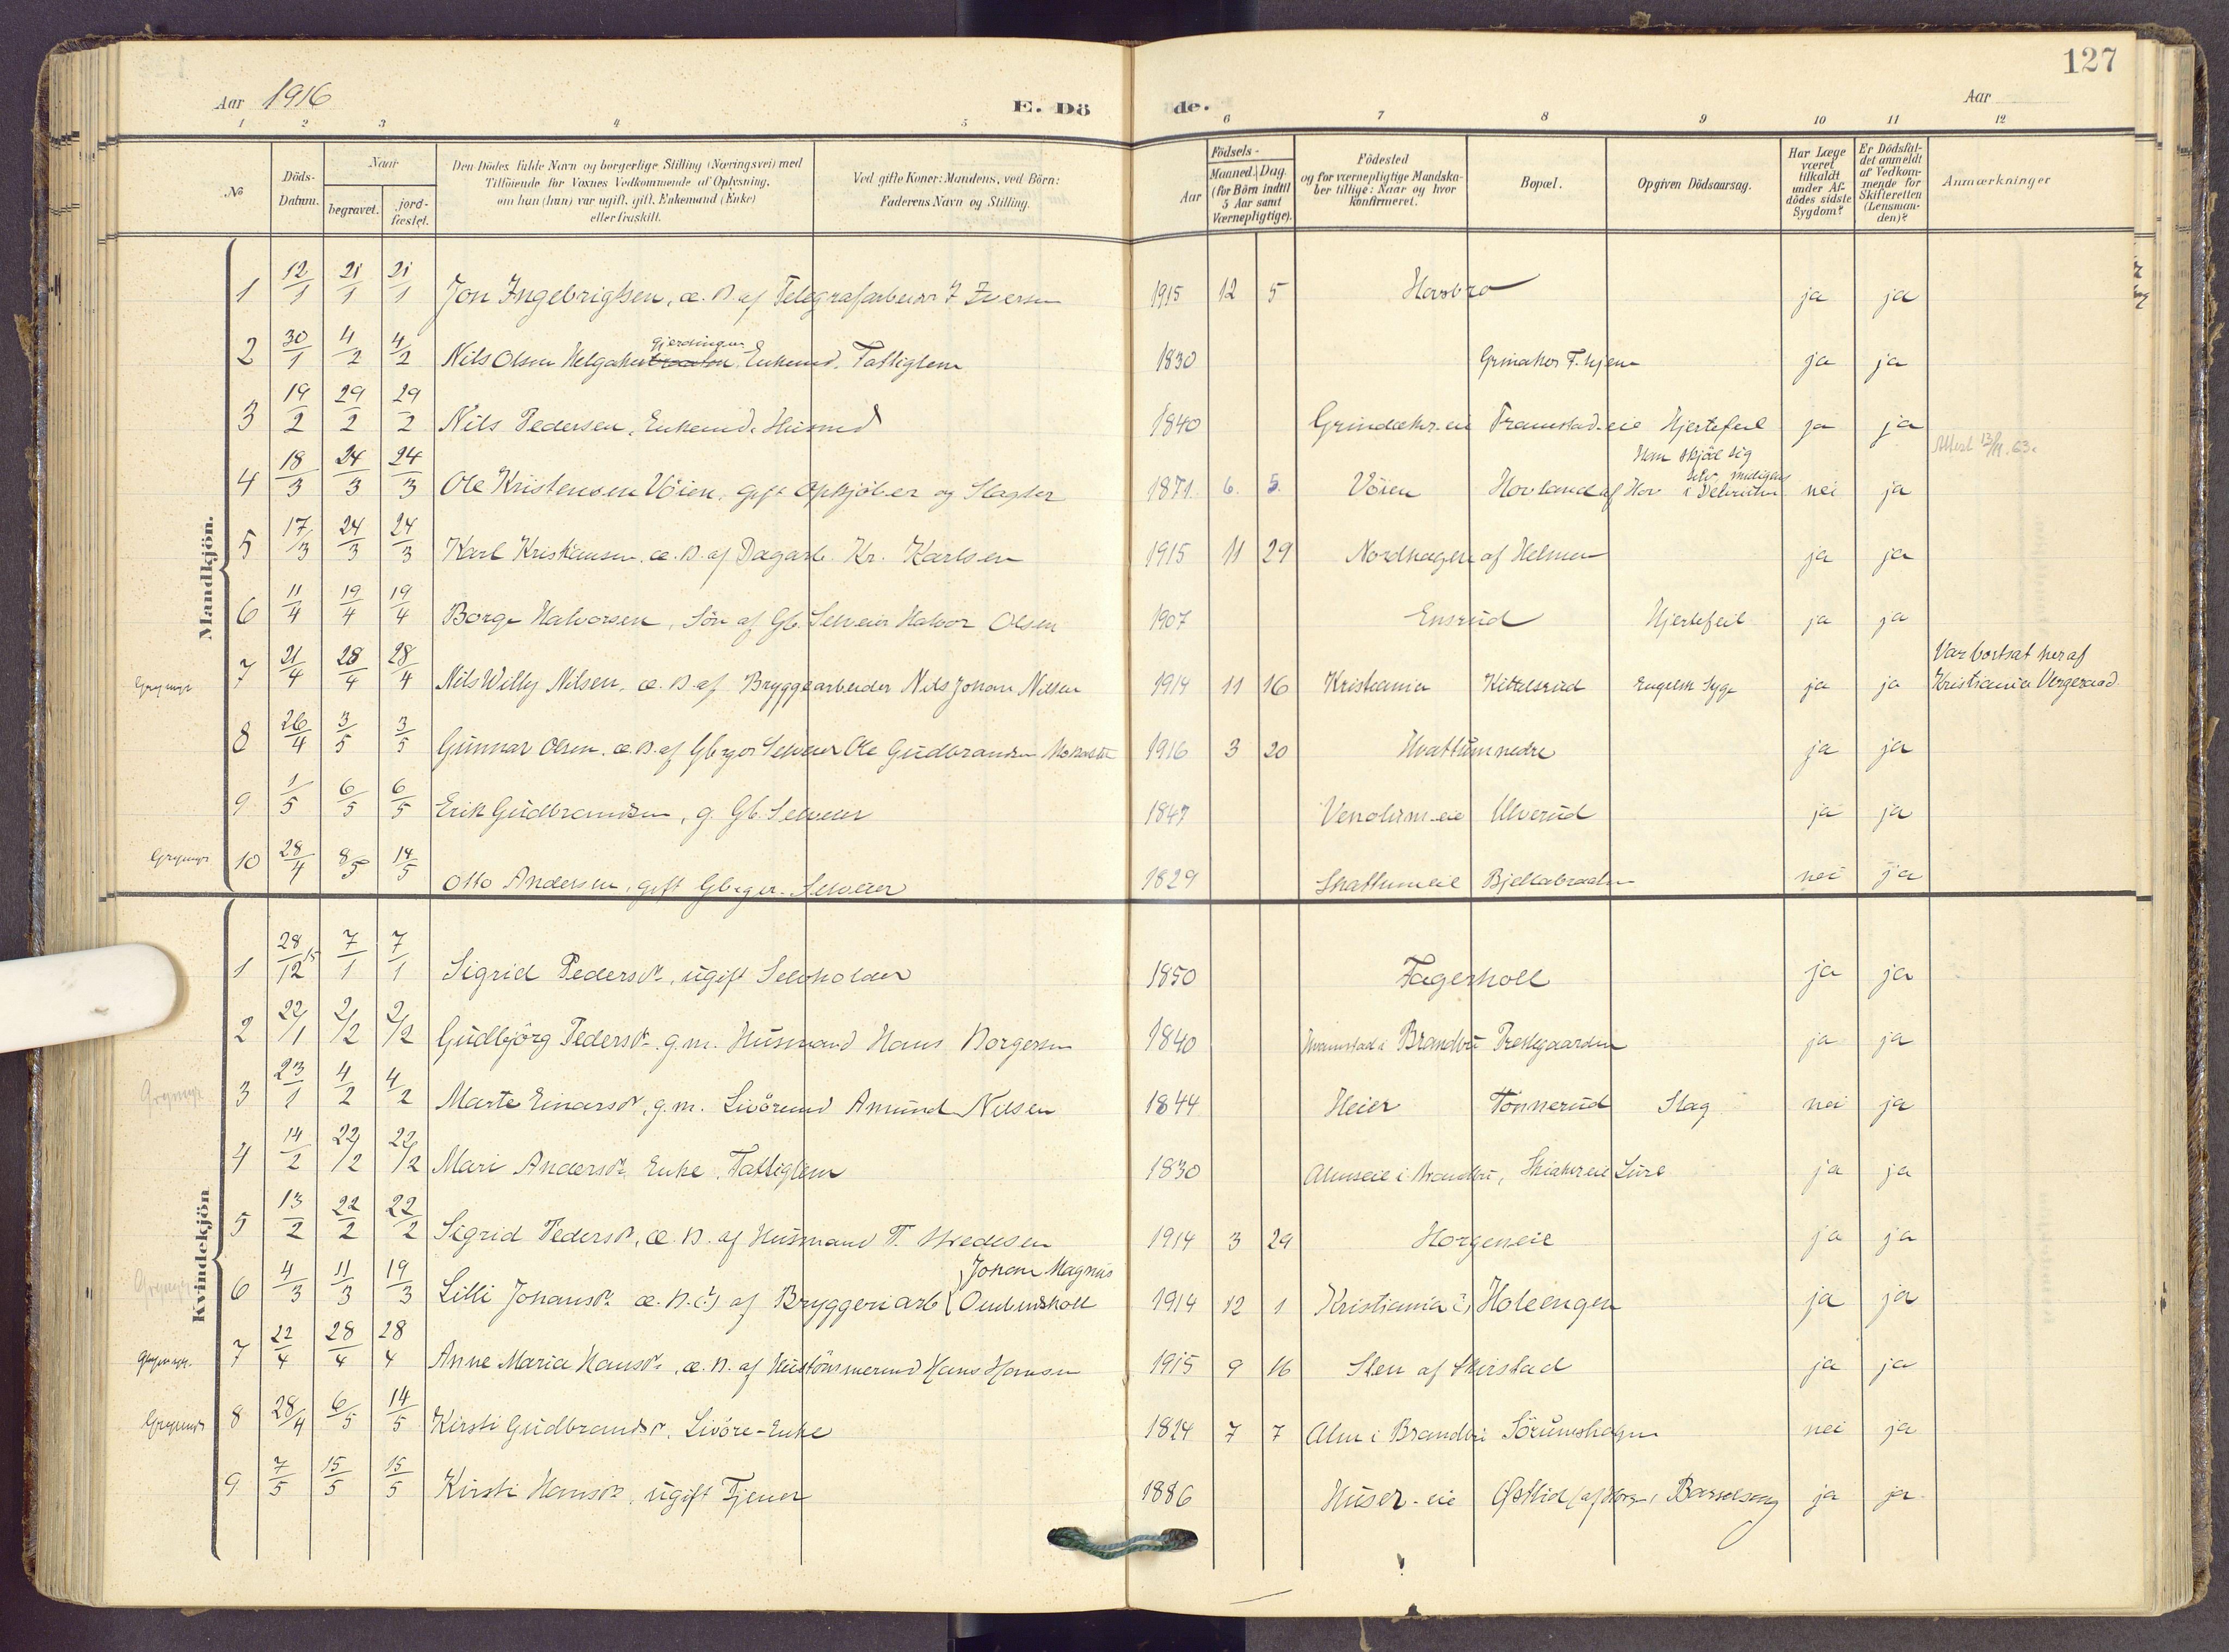 SAH, Gran prestekontor, Ministerialbok nr. 22, 1908-1918, s. 127